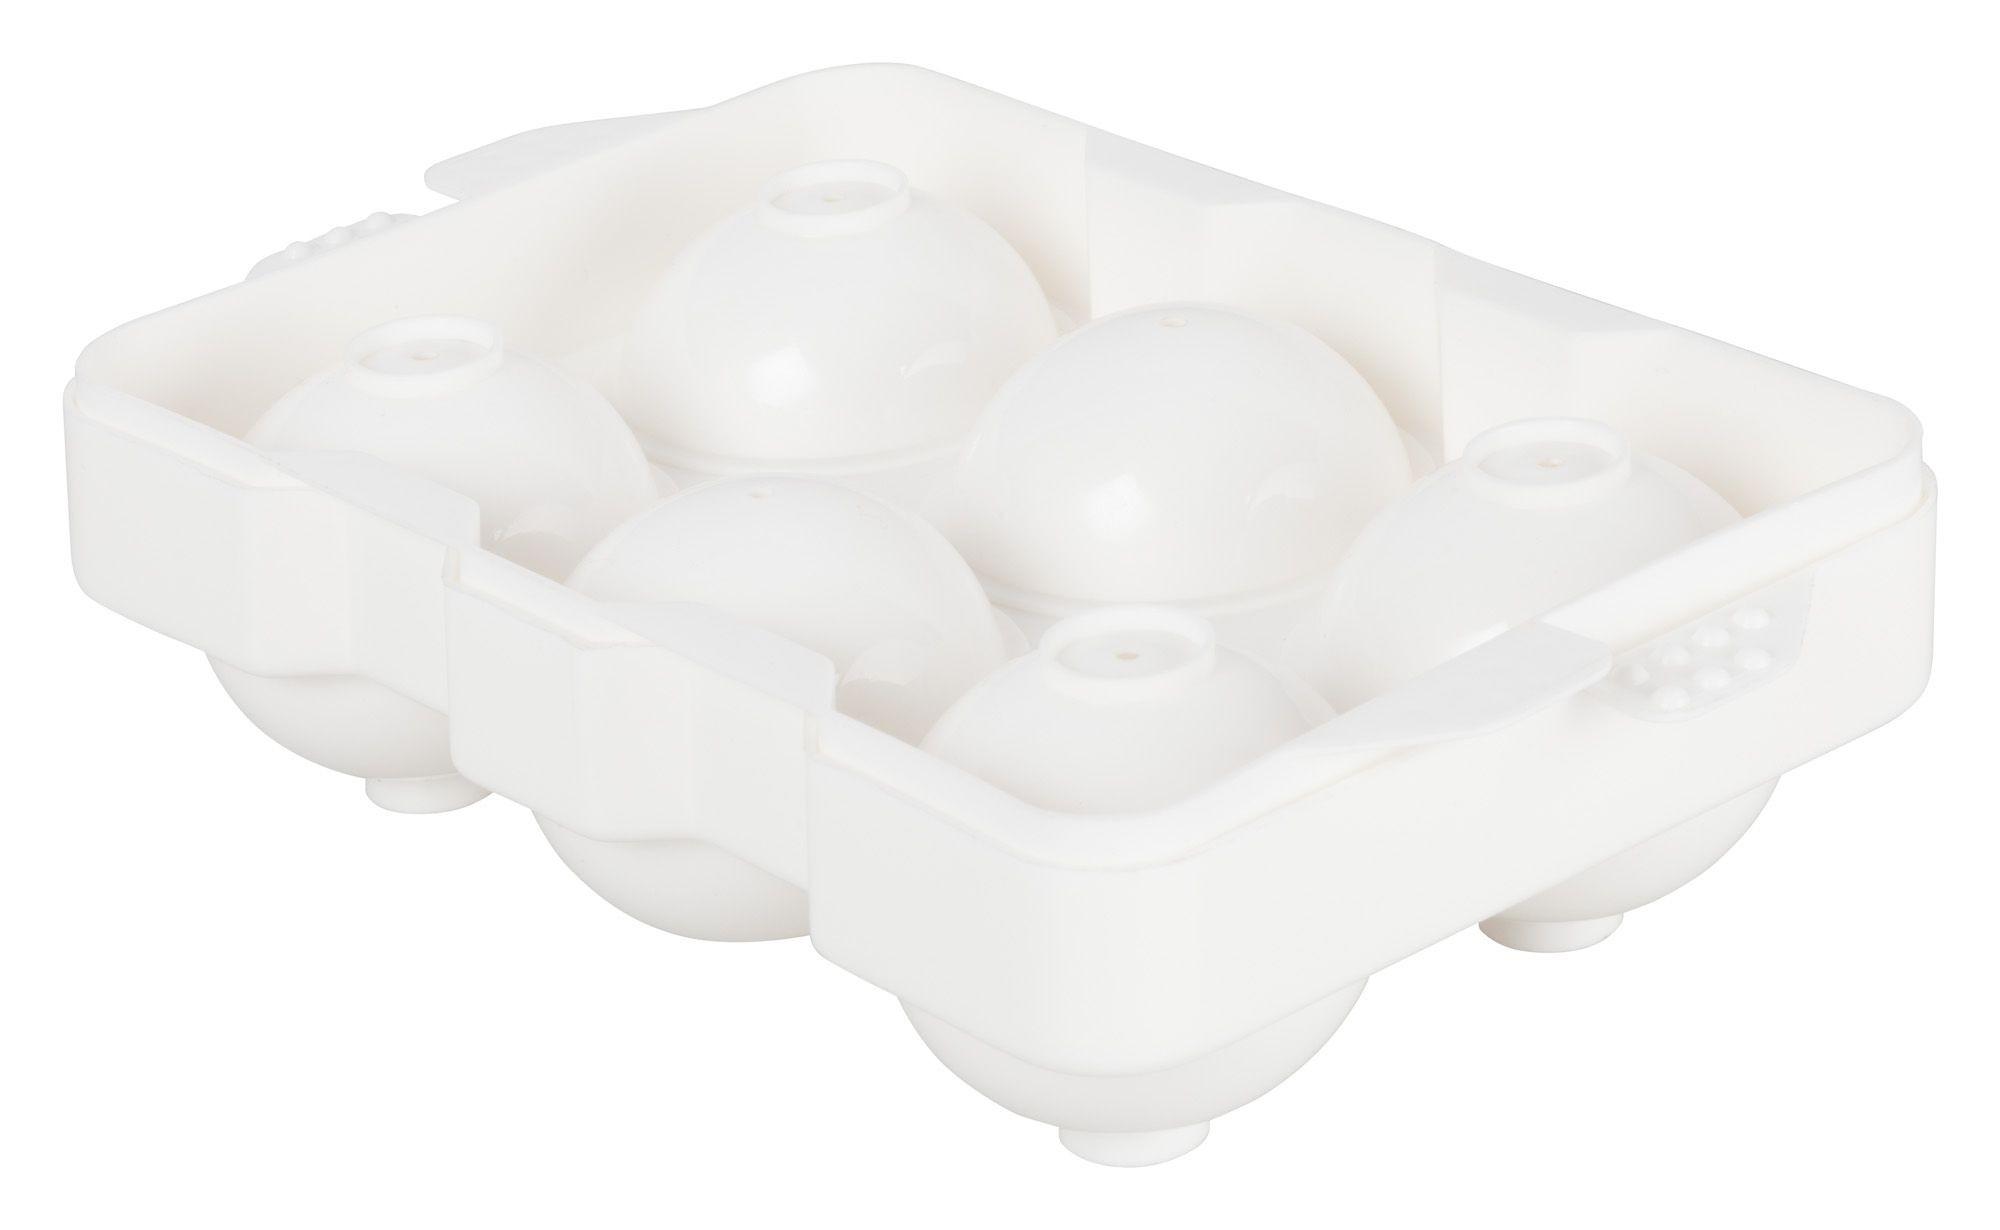 Winco ICCP-6W Round 6-Cube Ice Tray